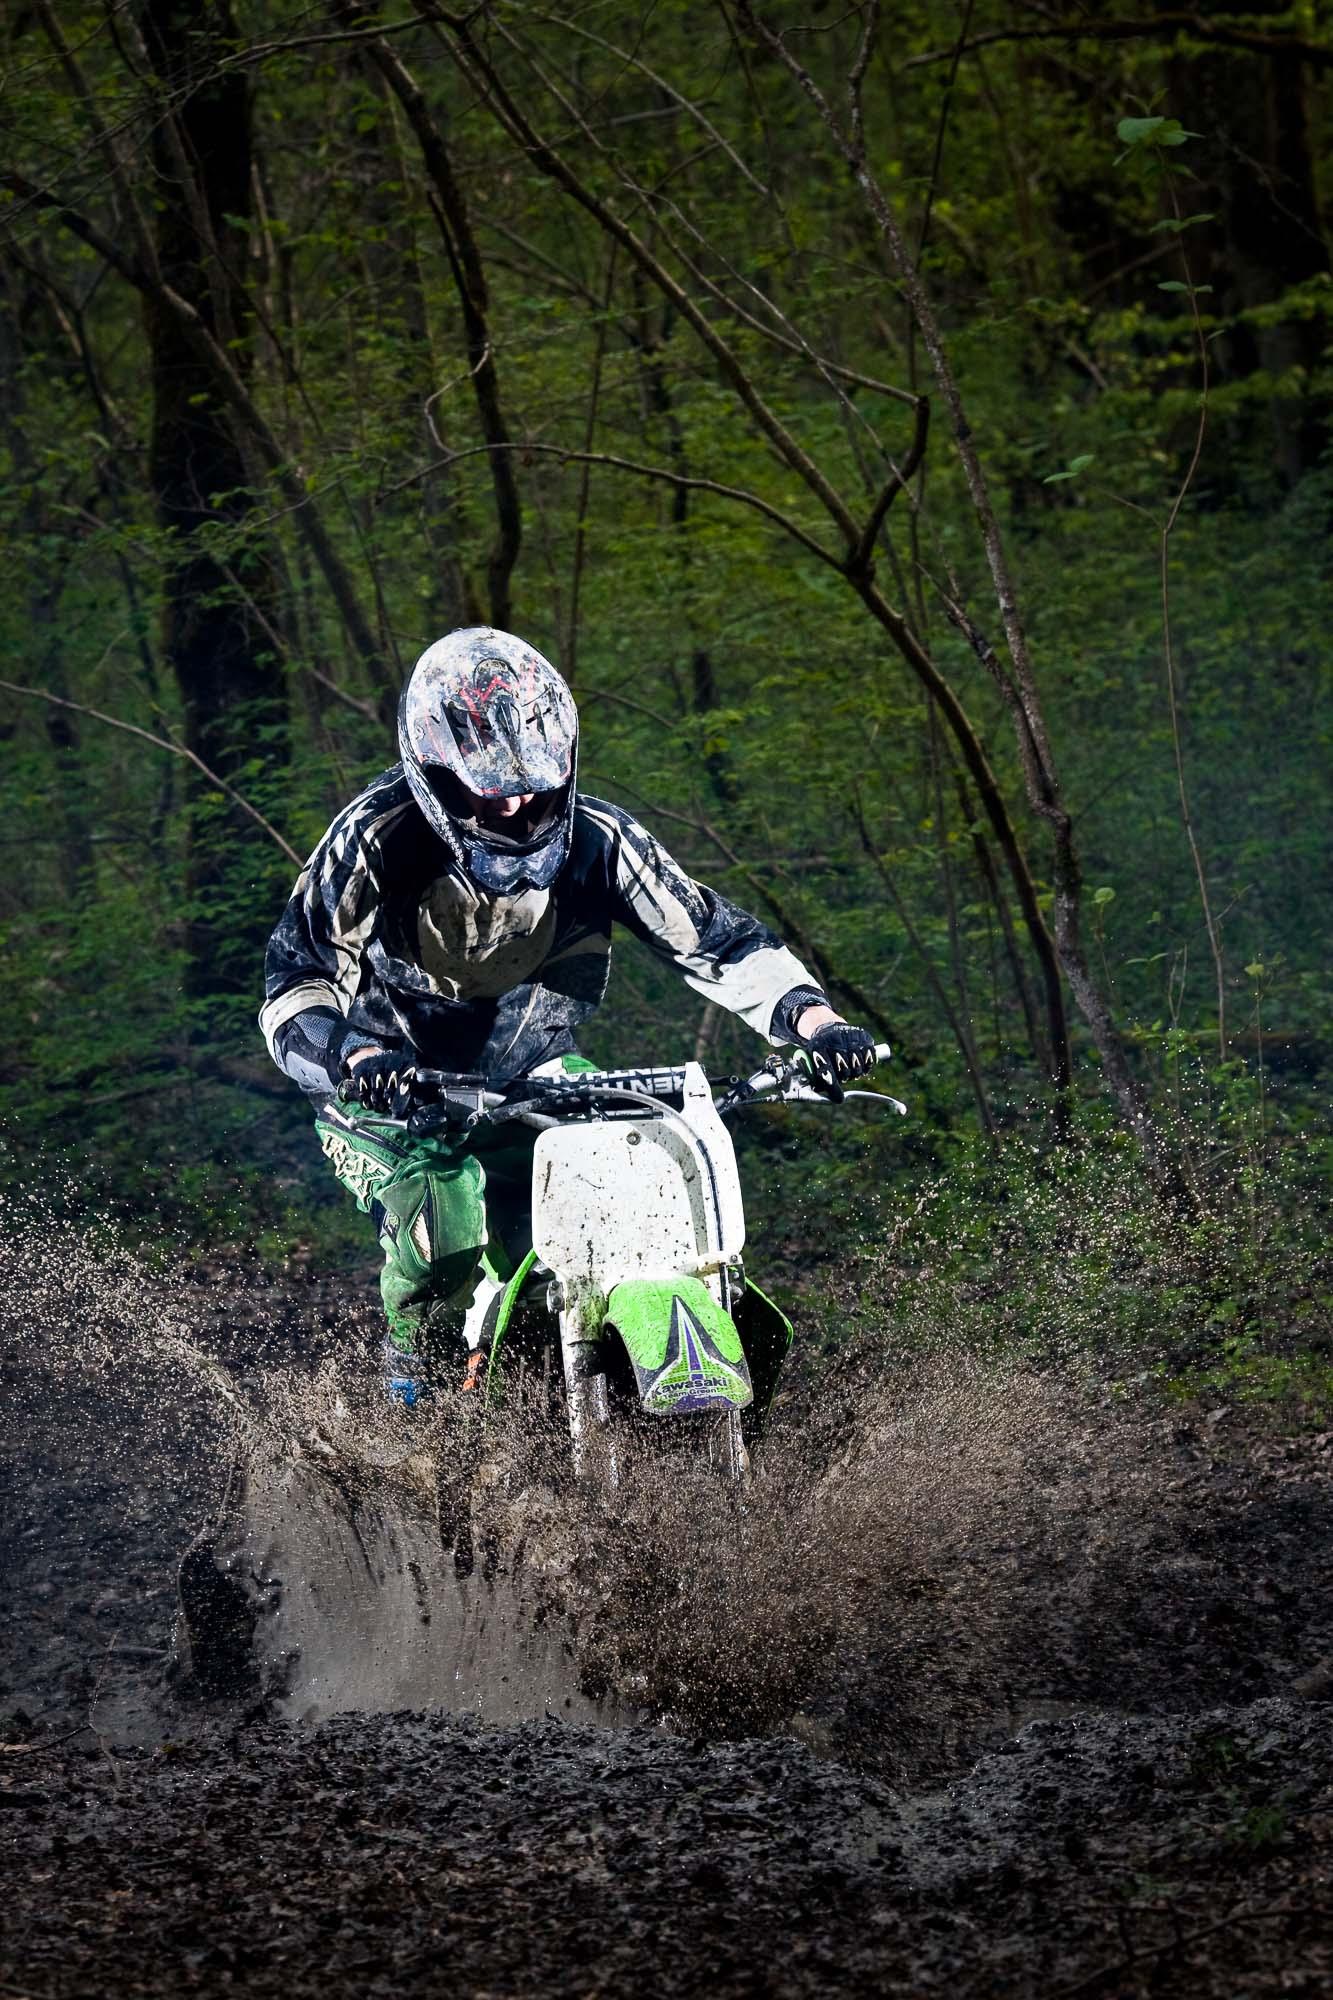 20100425-motos yvoire-9.jpg